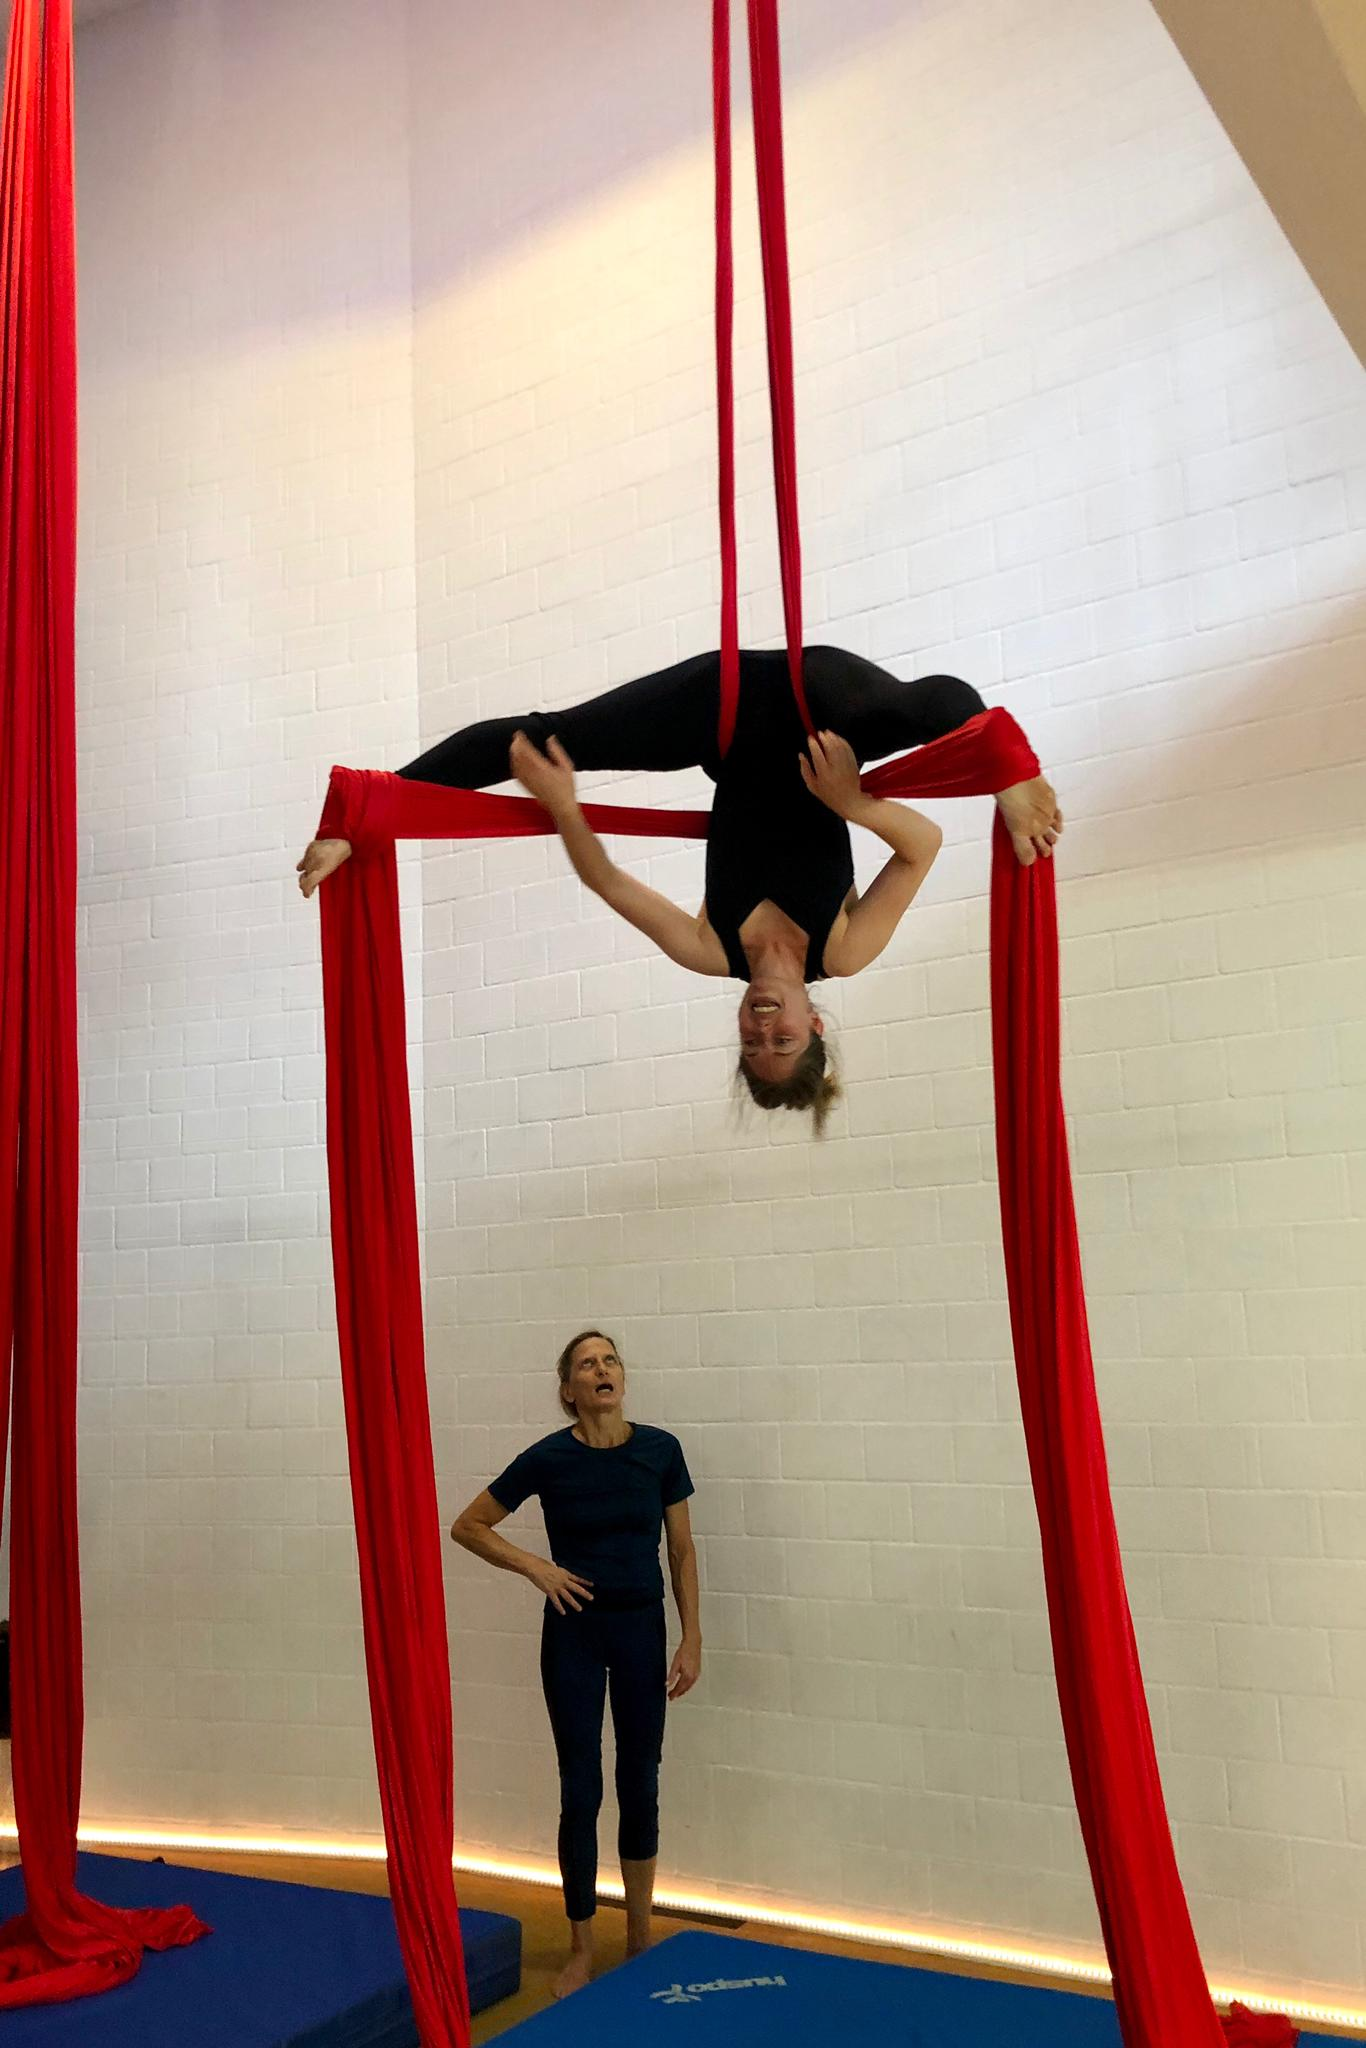 Zirkus-Wochenende Loft am Bach, Dietlikon Zürich